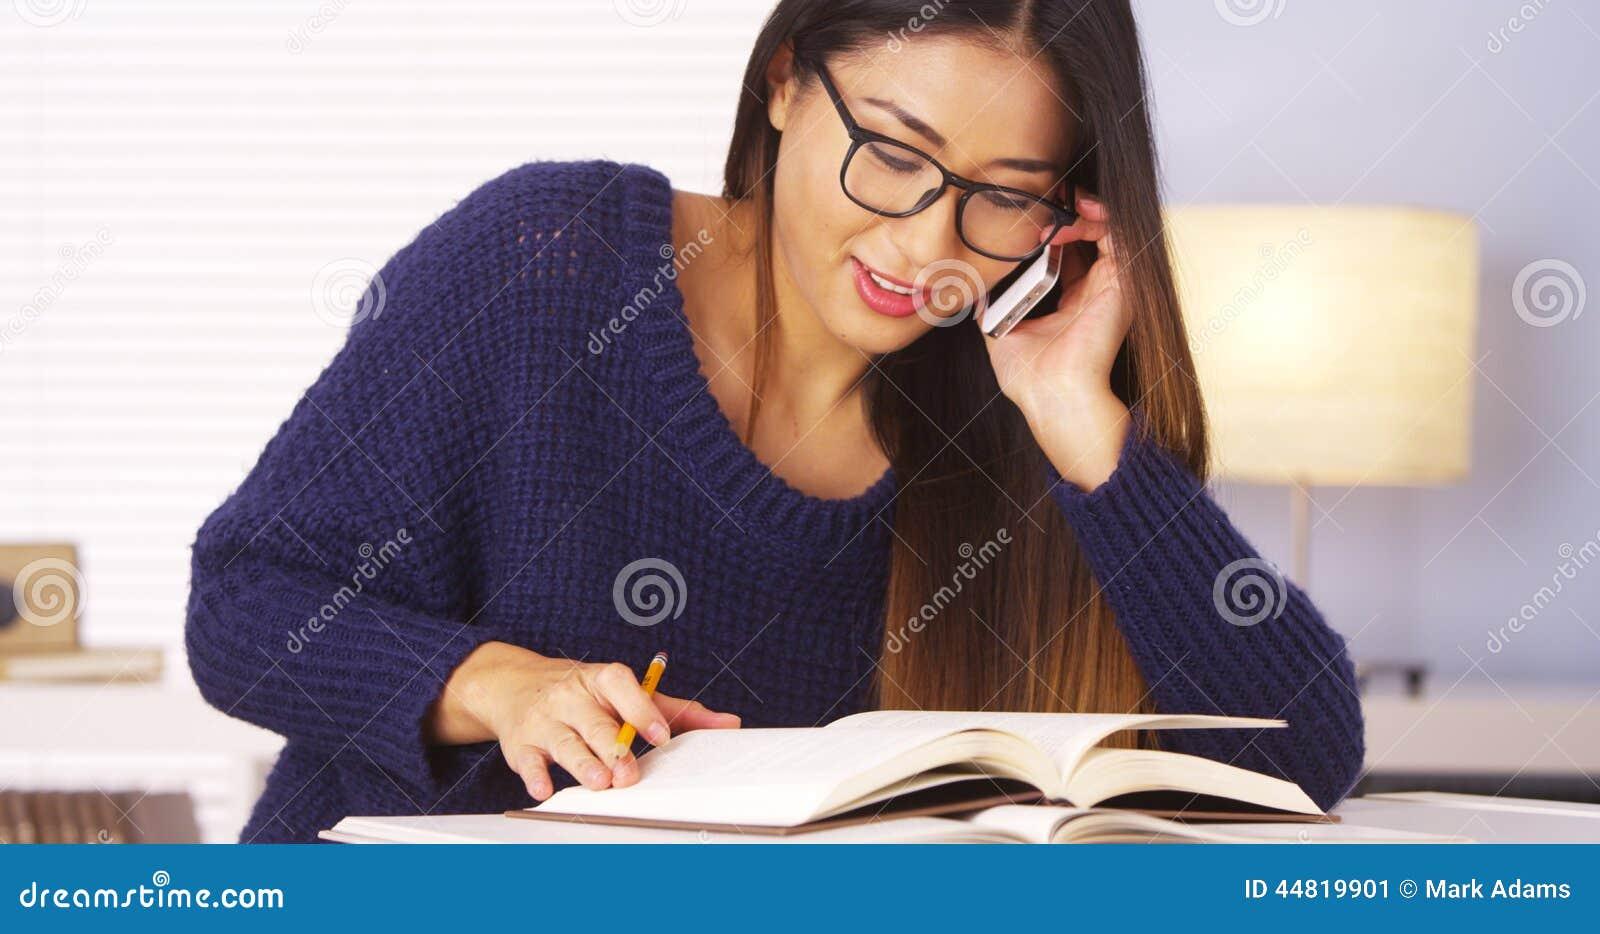 asian clothes homework help